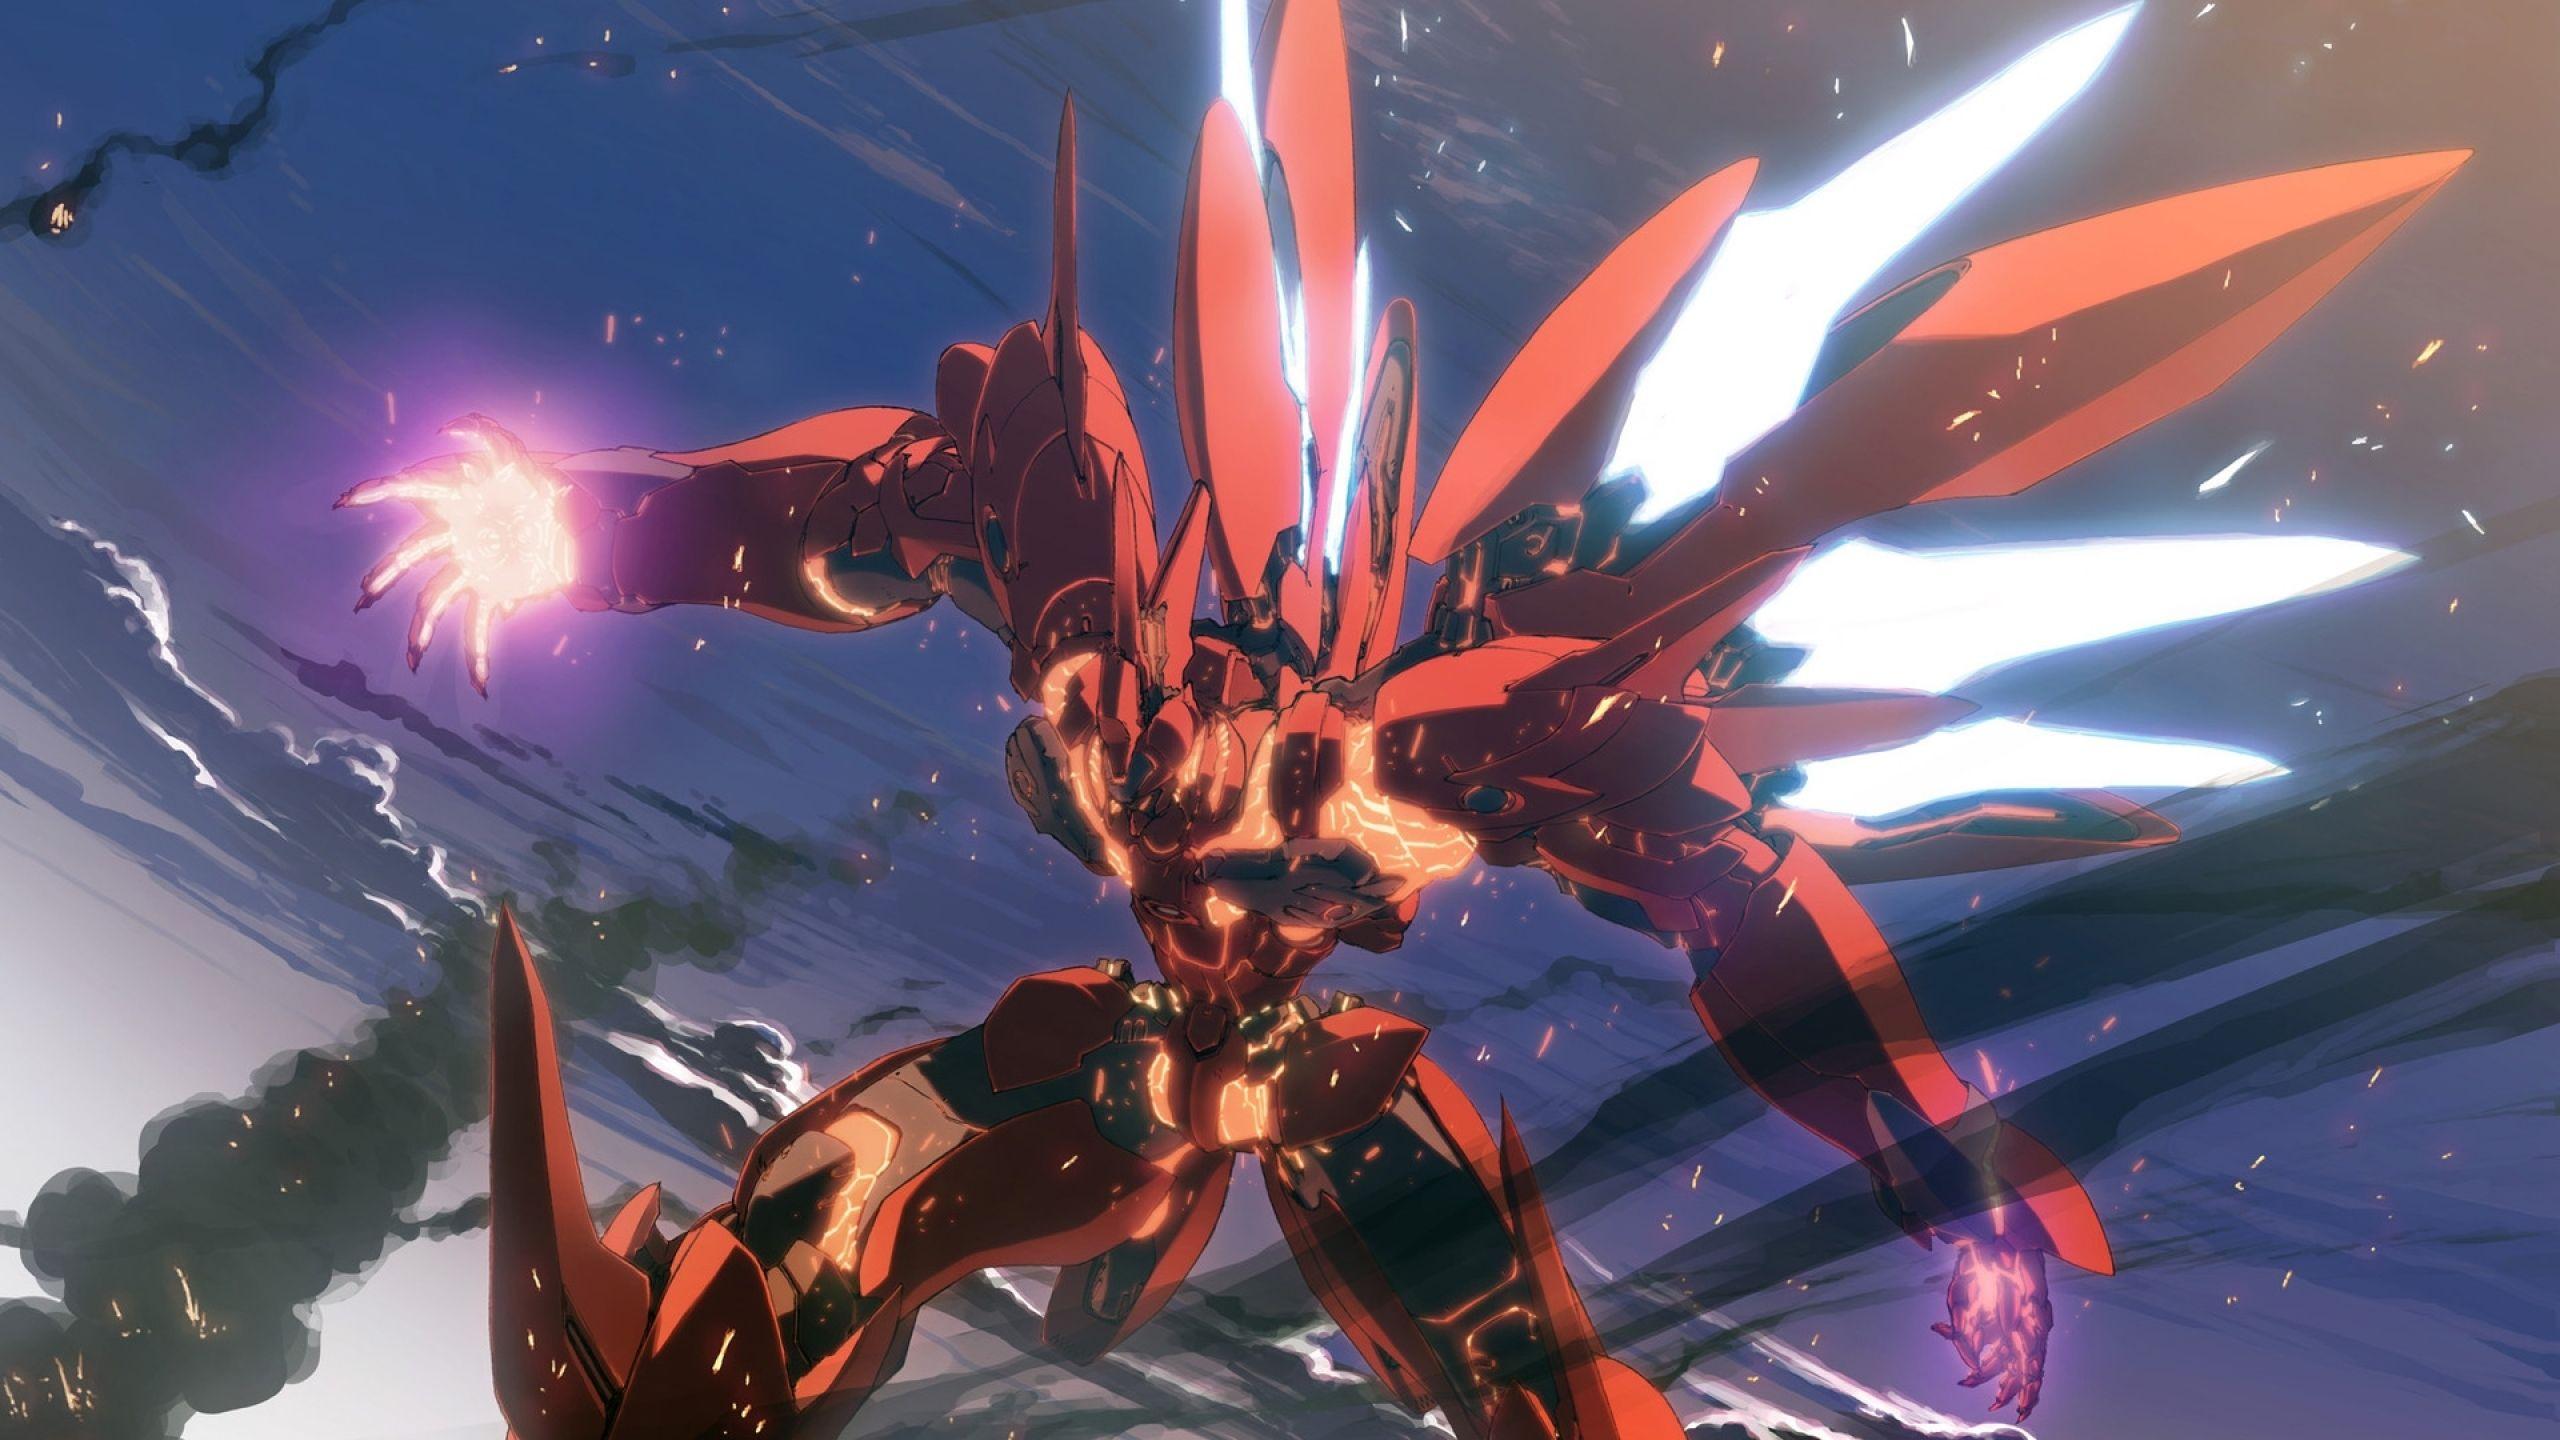 Wings Robots Mecha Anime X Wallpaper Art Hd Wallpaper